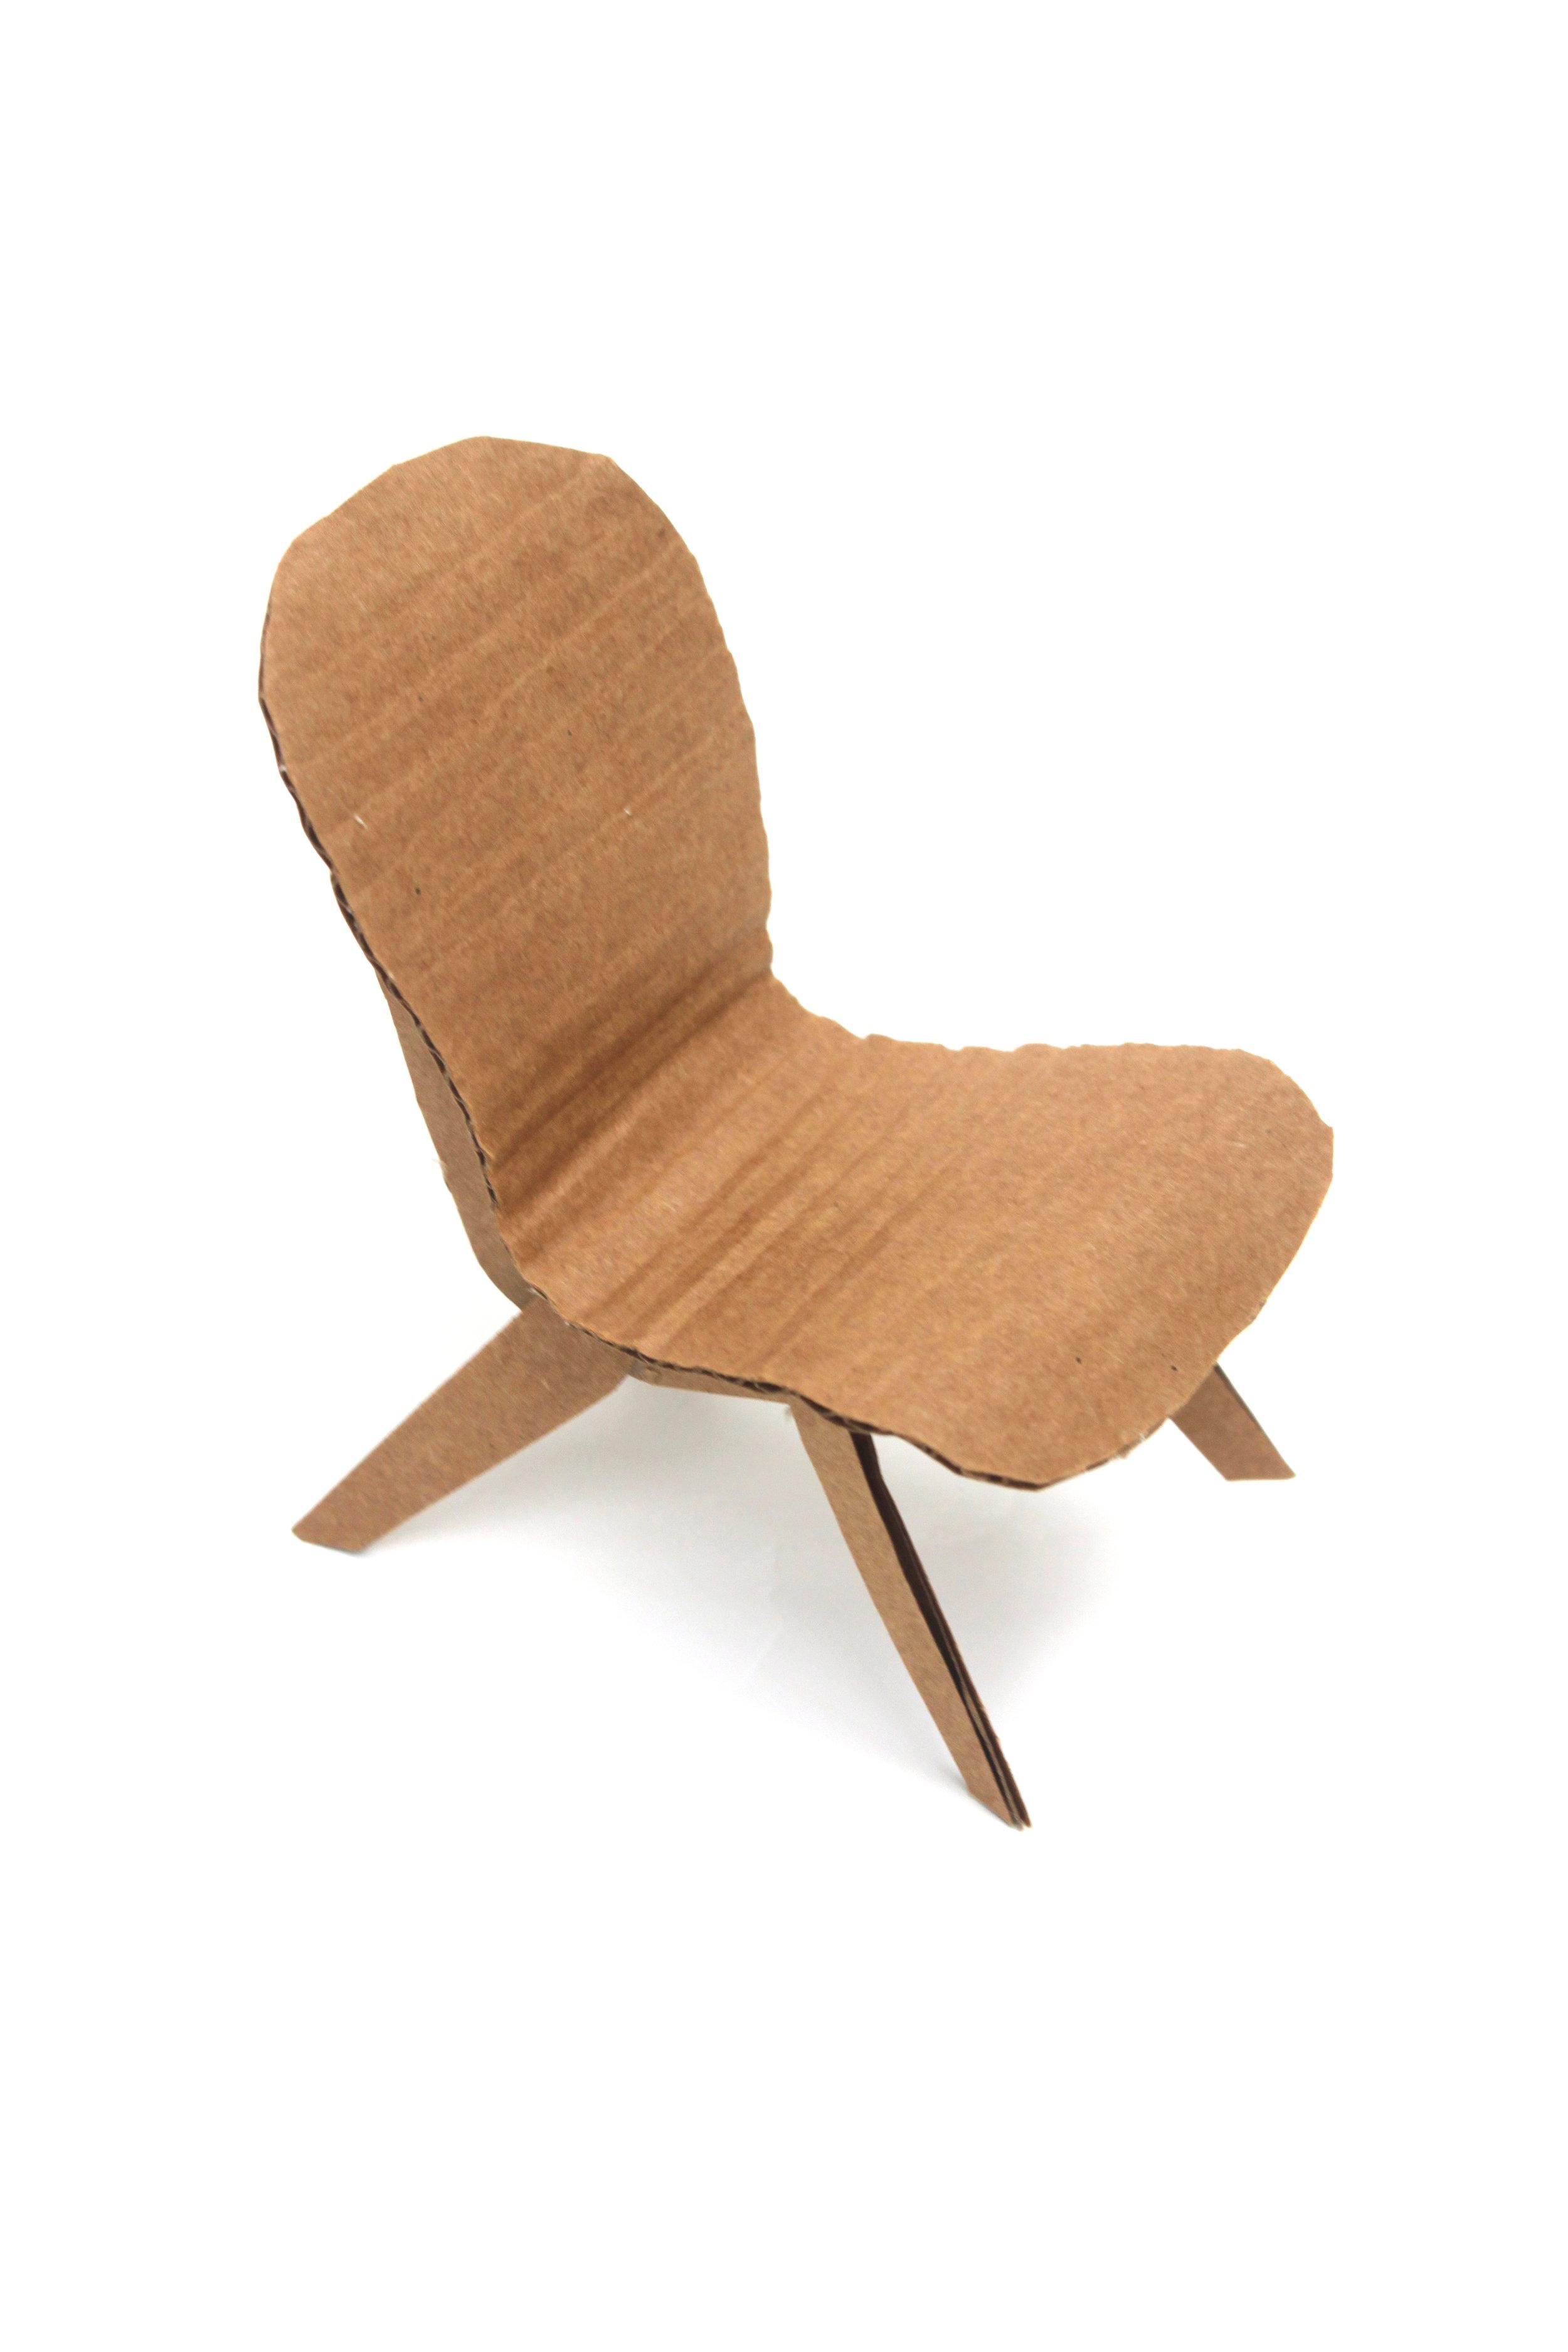 gretchen-chair-model-nicholas-baker